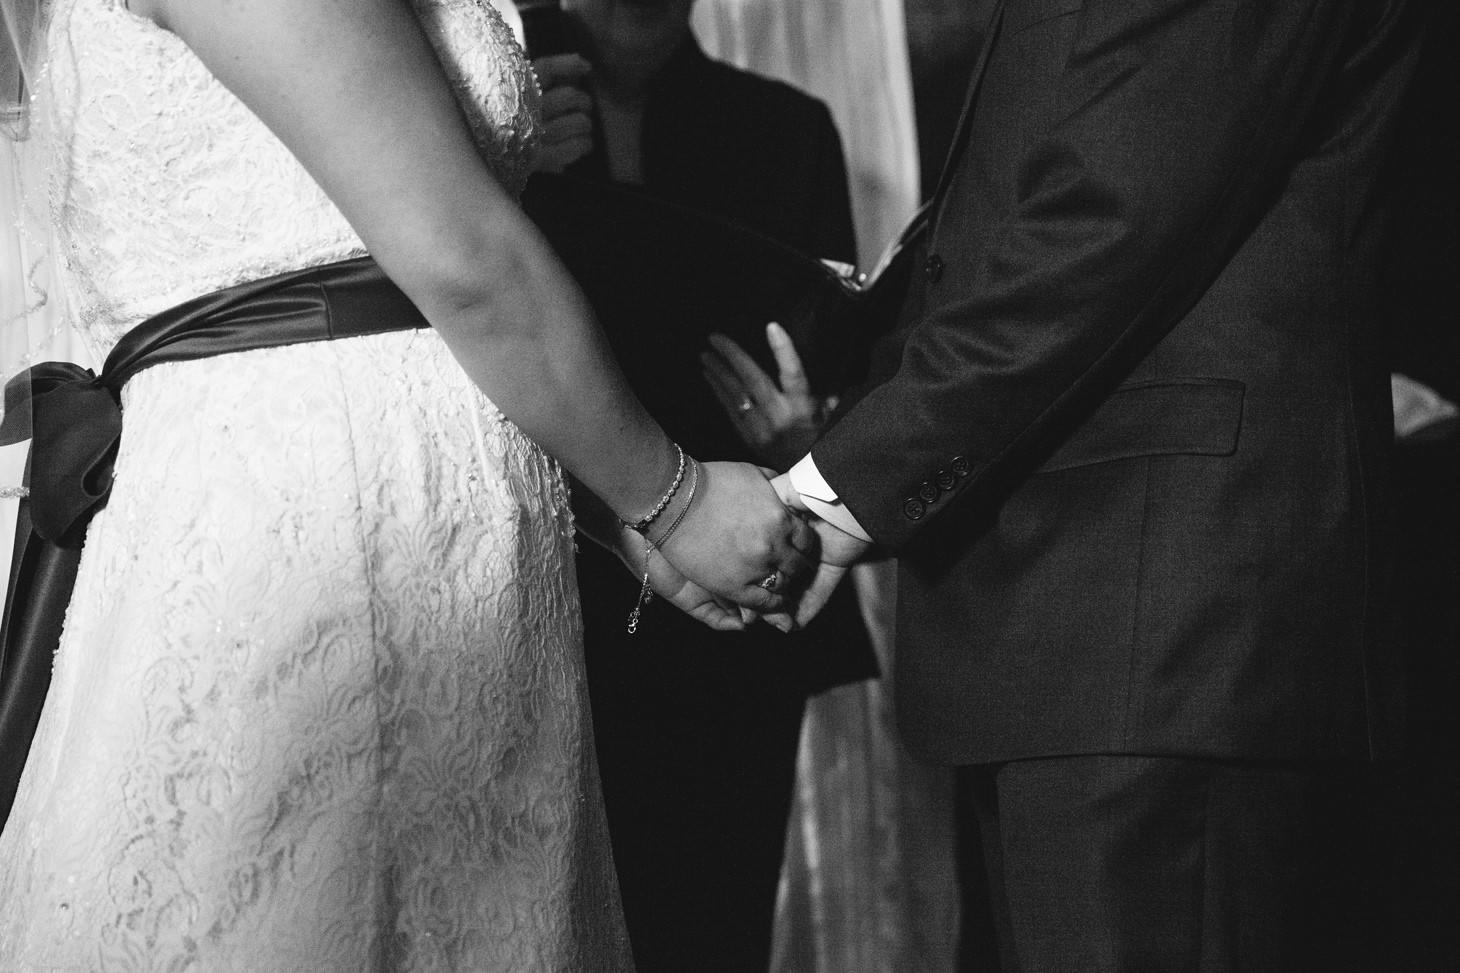 035-nyc-wedding-portrait-photographer-times-square-muse-hotel-winter-wedding-smitten-chickens.jpg